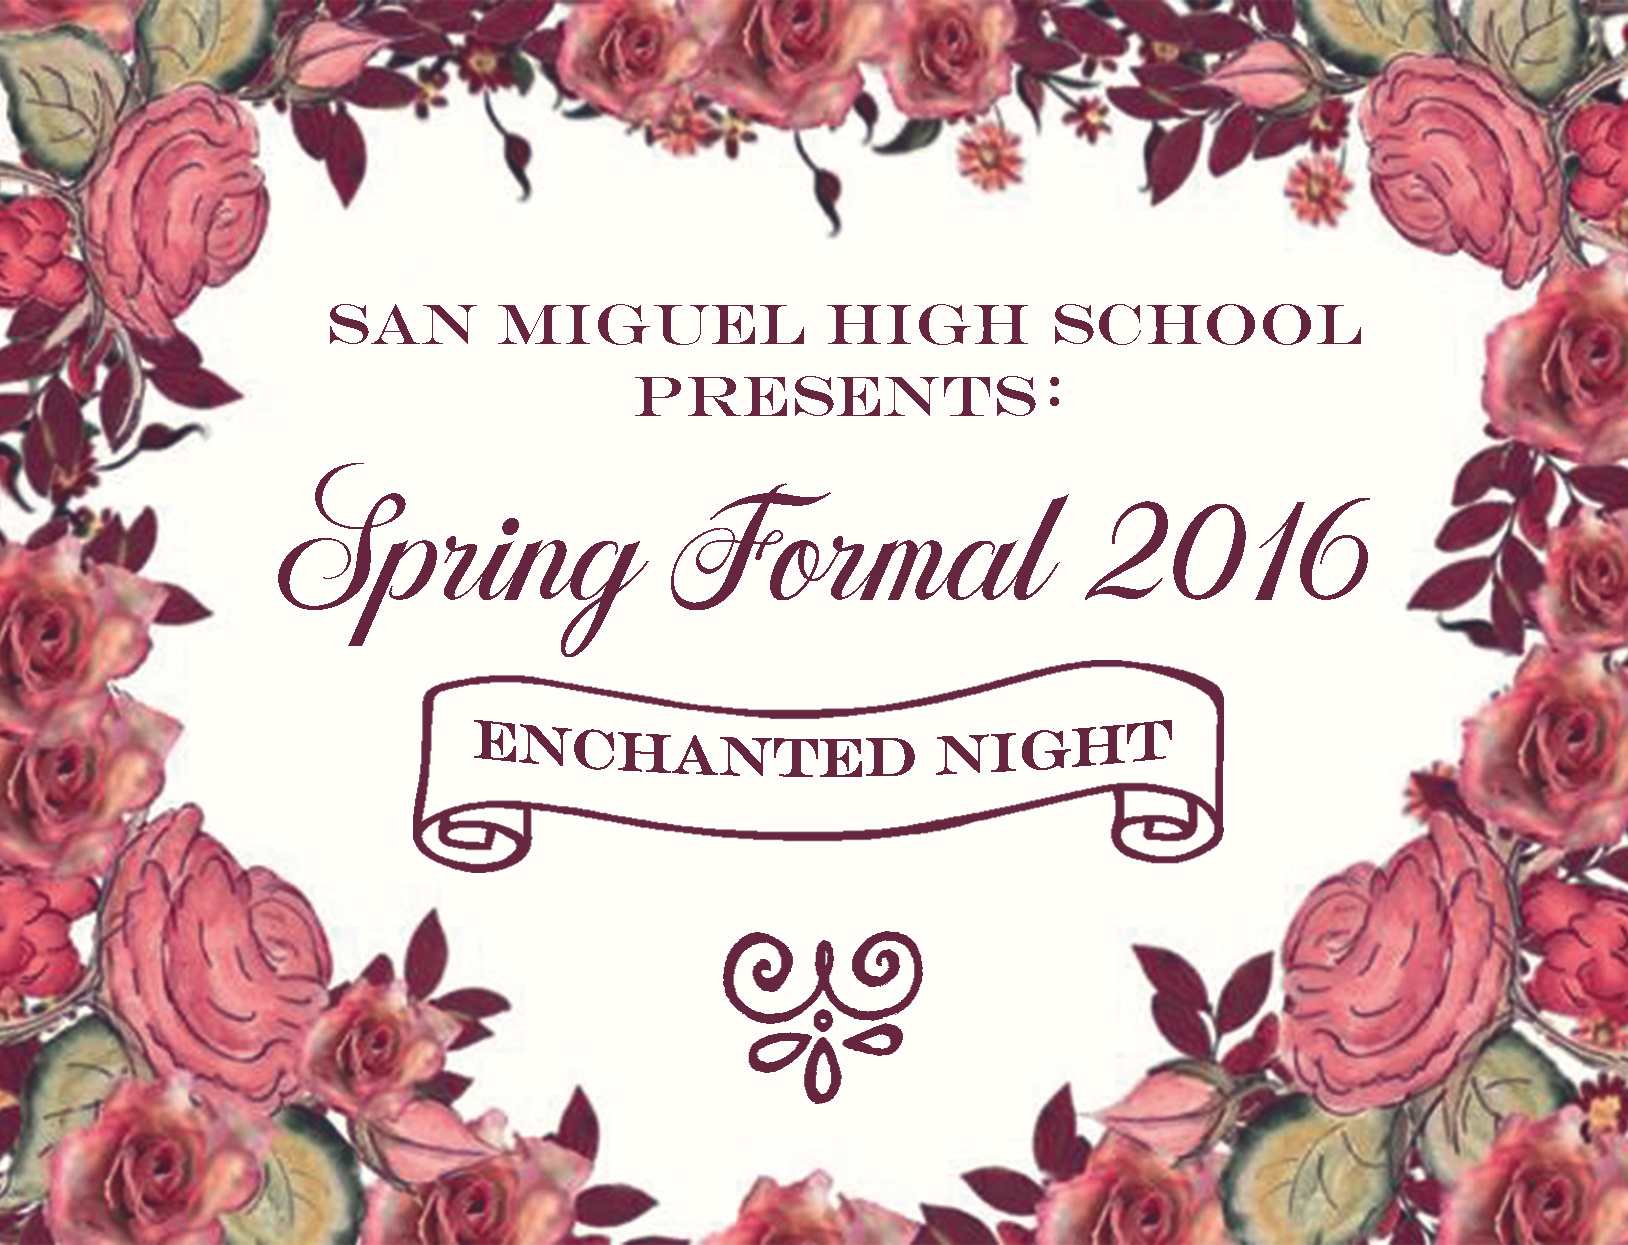 San Miguel High School Prom